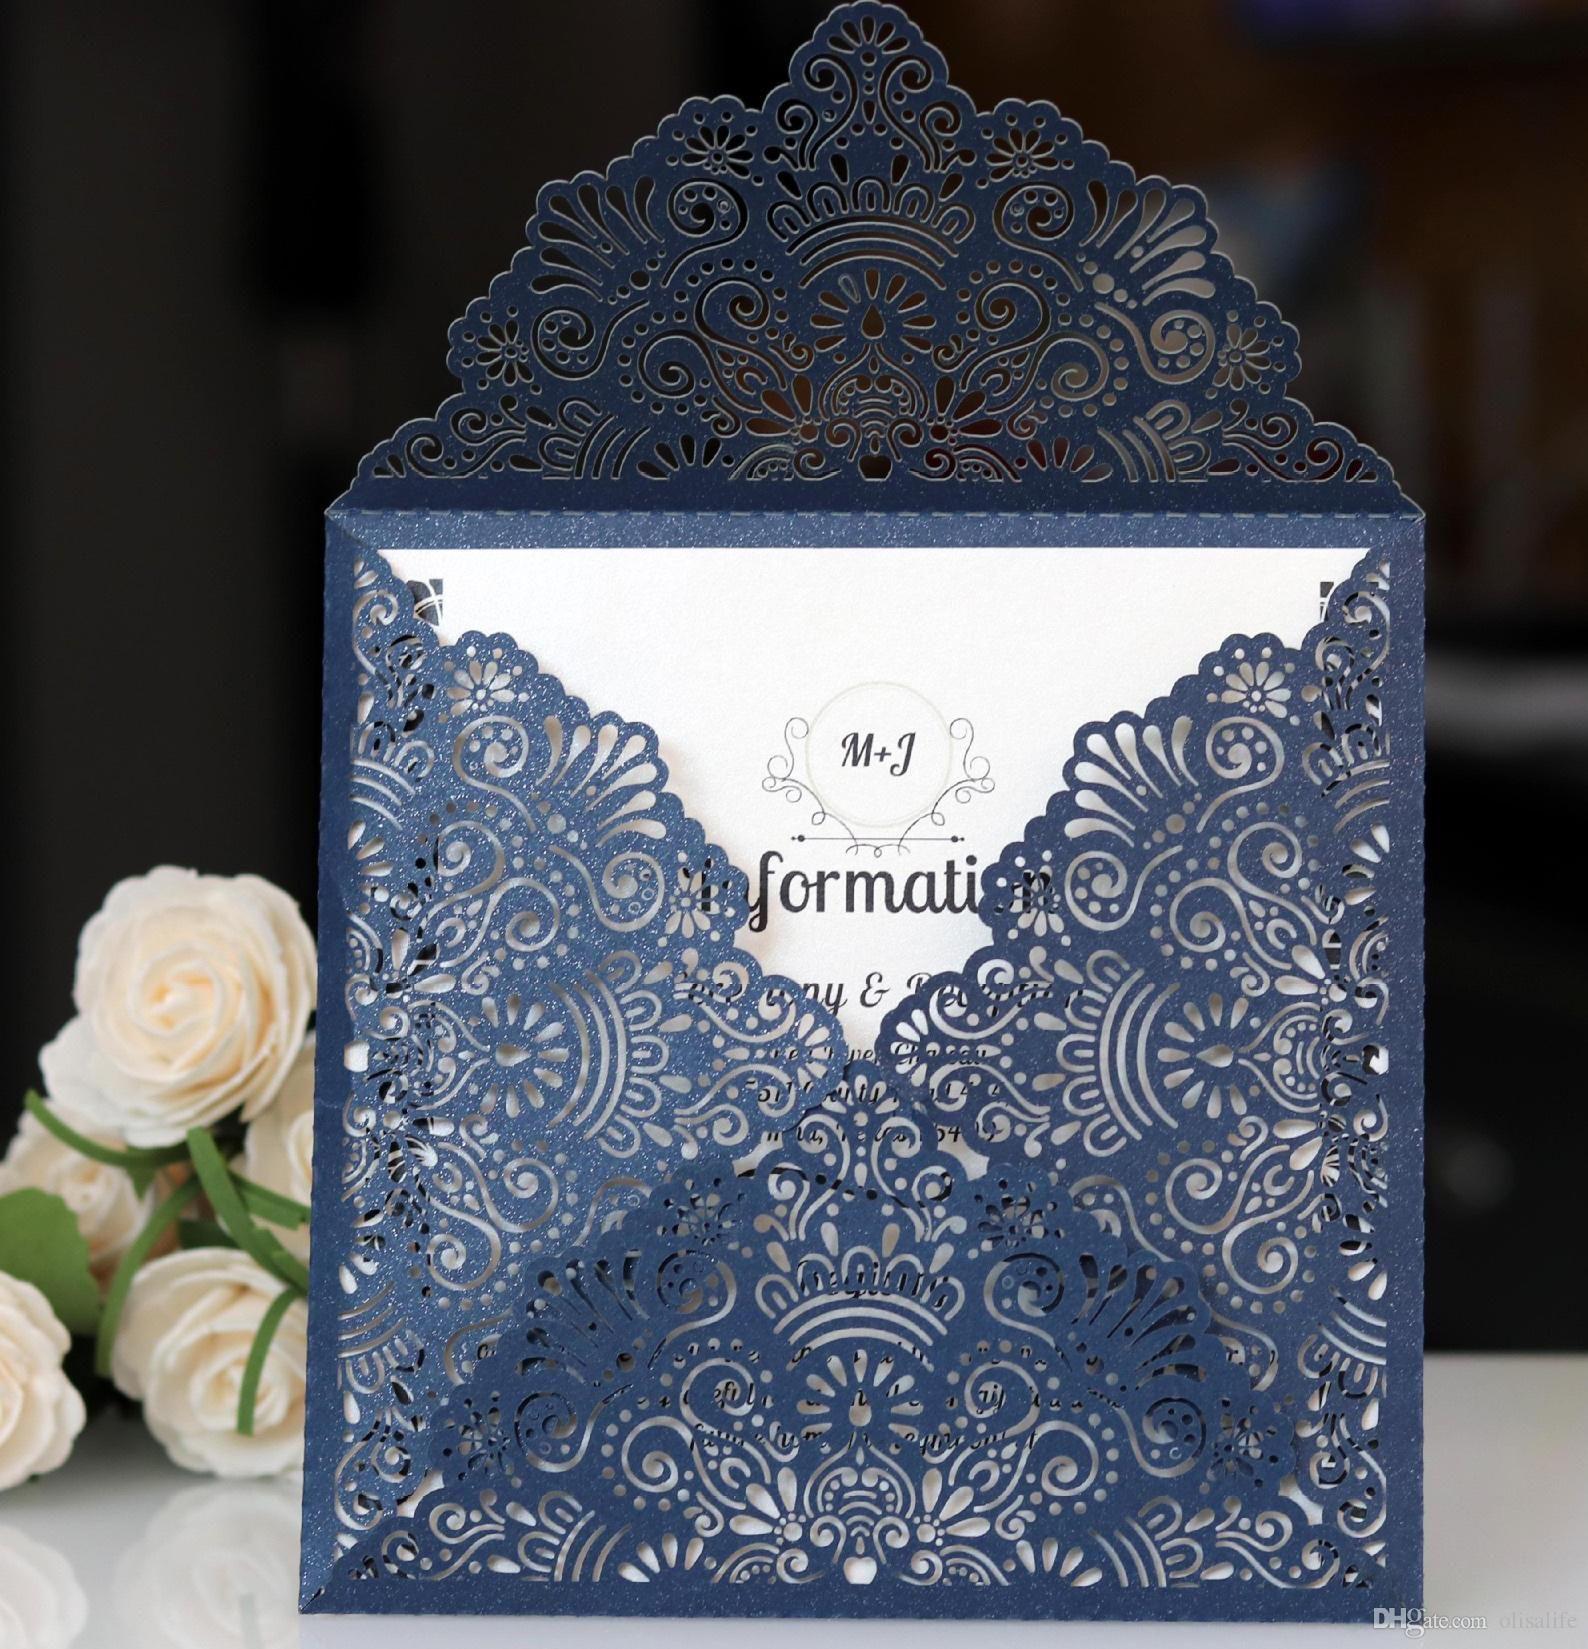 Western 2018 Laser Hollow Personal Free Printed Invitation Invites Custom With Envelope Wedding Accessory Blank Inner Butterfly: Blank Wedding Invitation Invitation At Websimilar.org